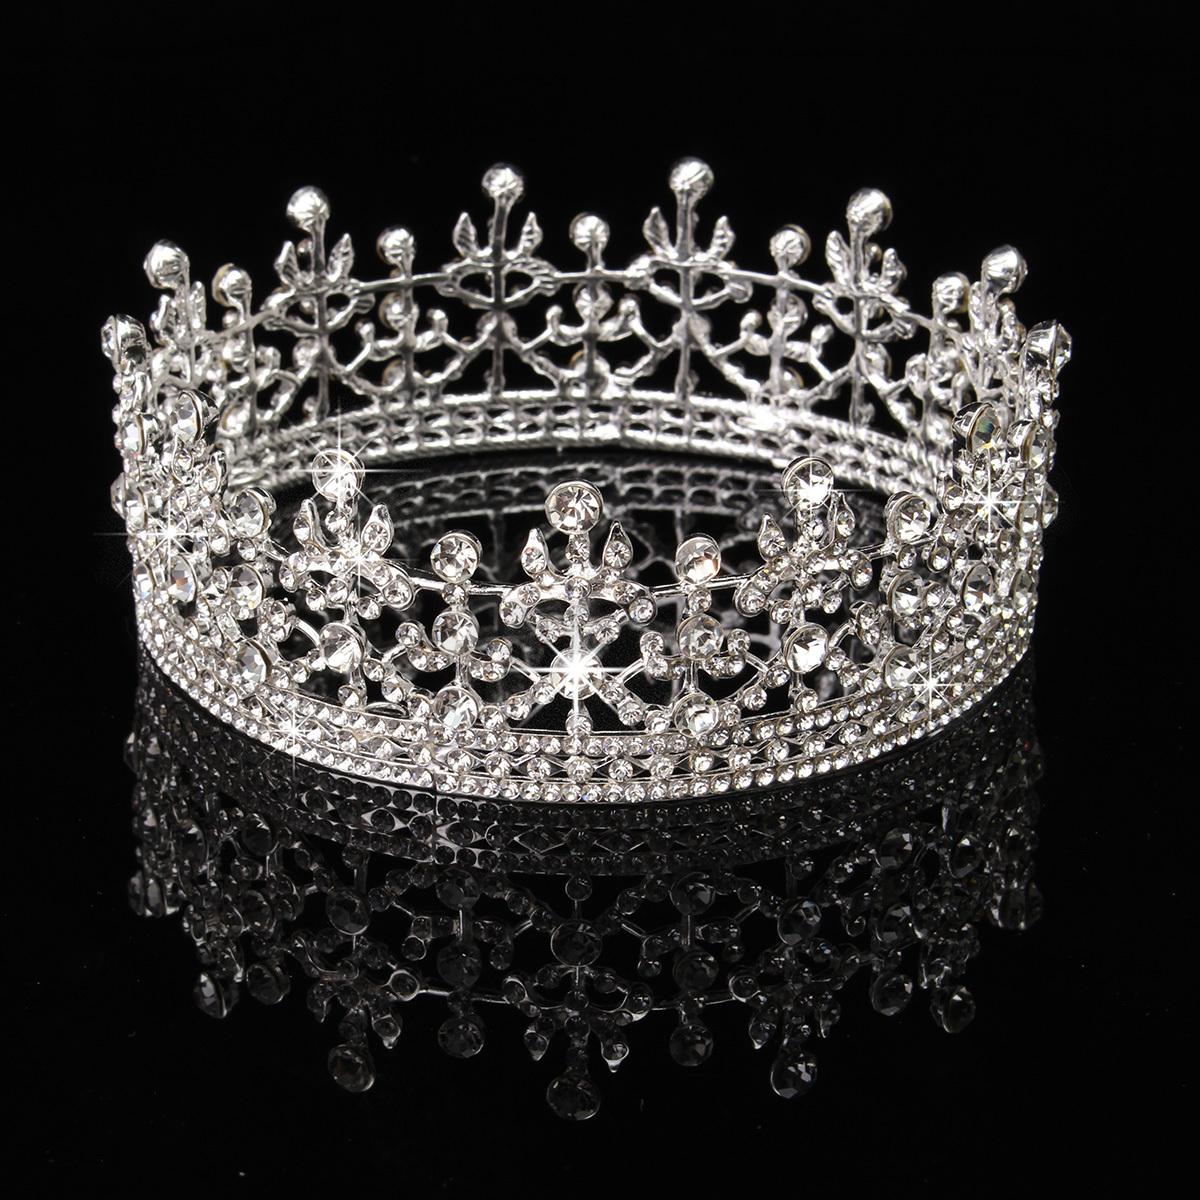 Princess Bridal Rhinestone Crystal Hair Tiara Wedding Crown Veil Headband USA